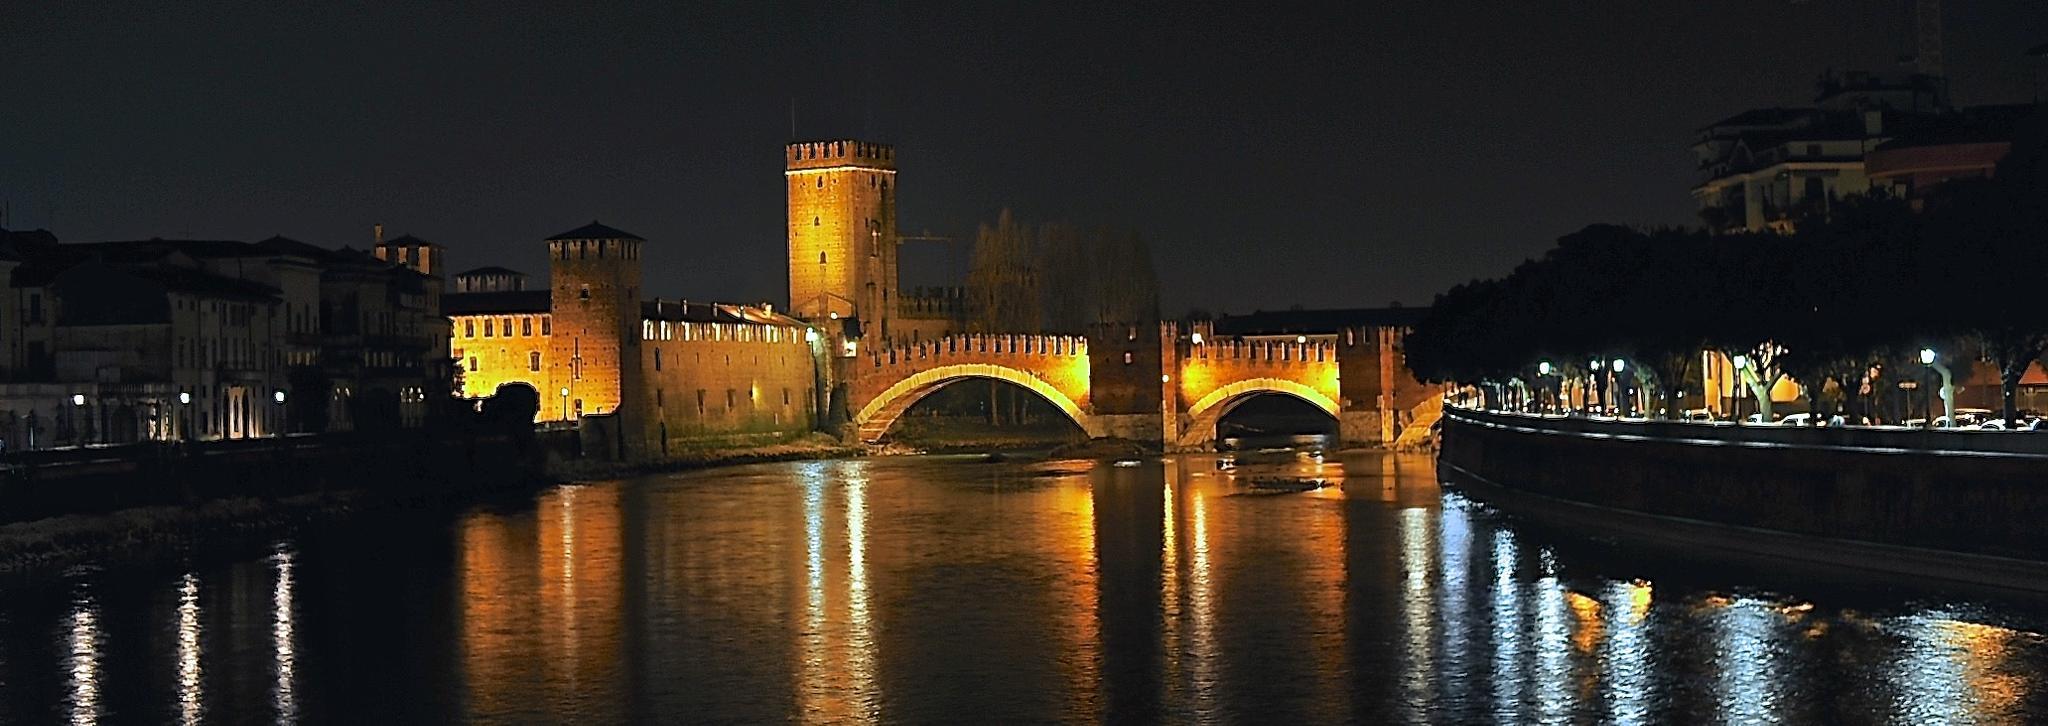 CASTELVECCHIO ...VERONA:::ITALY by checasin